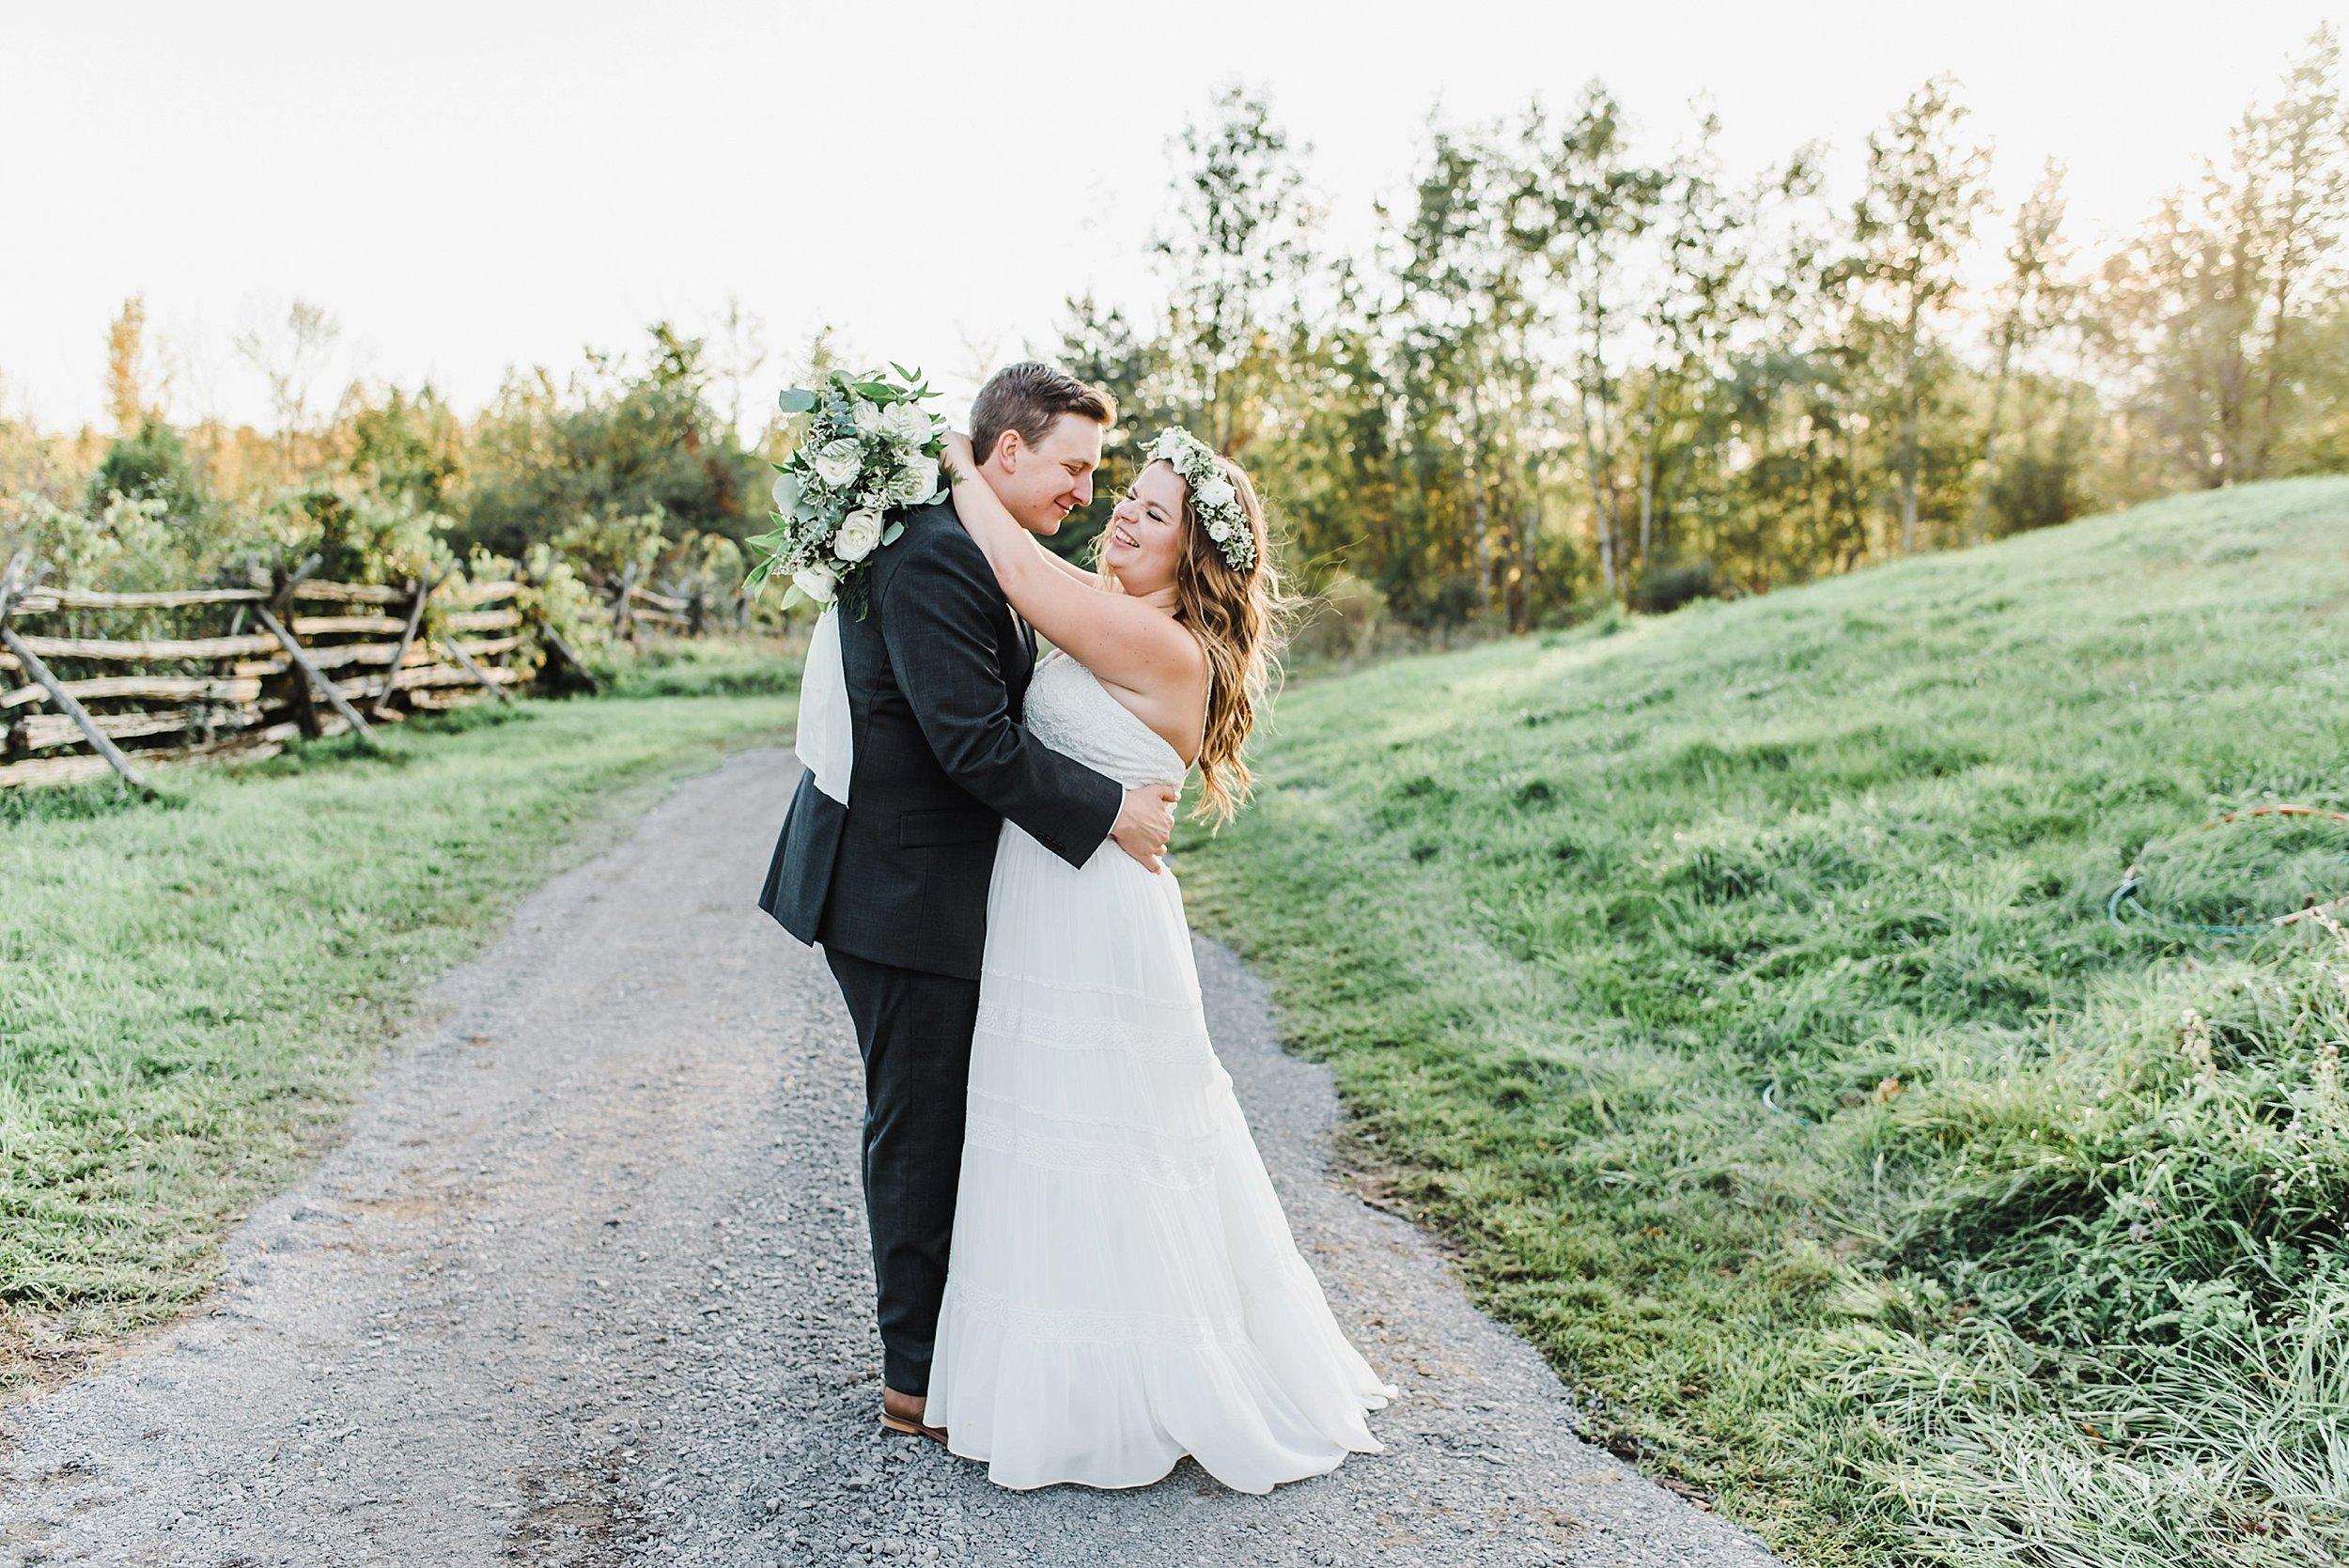 light airy indie fine art ottawa wedding photographer | Ali and Batoul Photography_1200.jpg